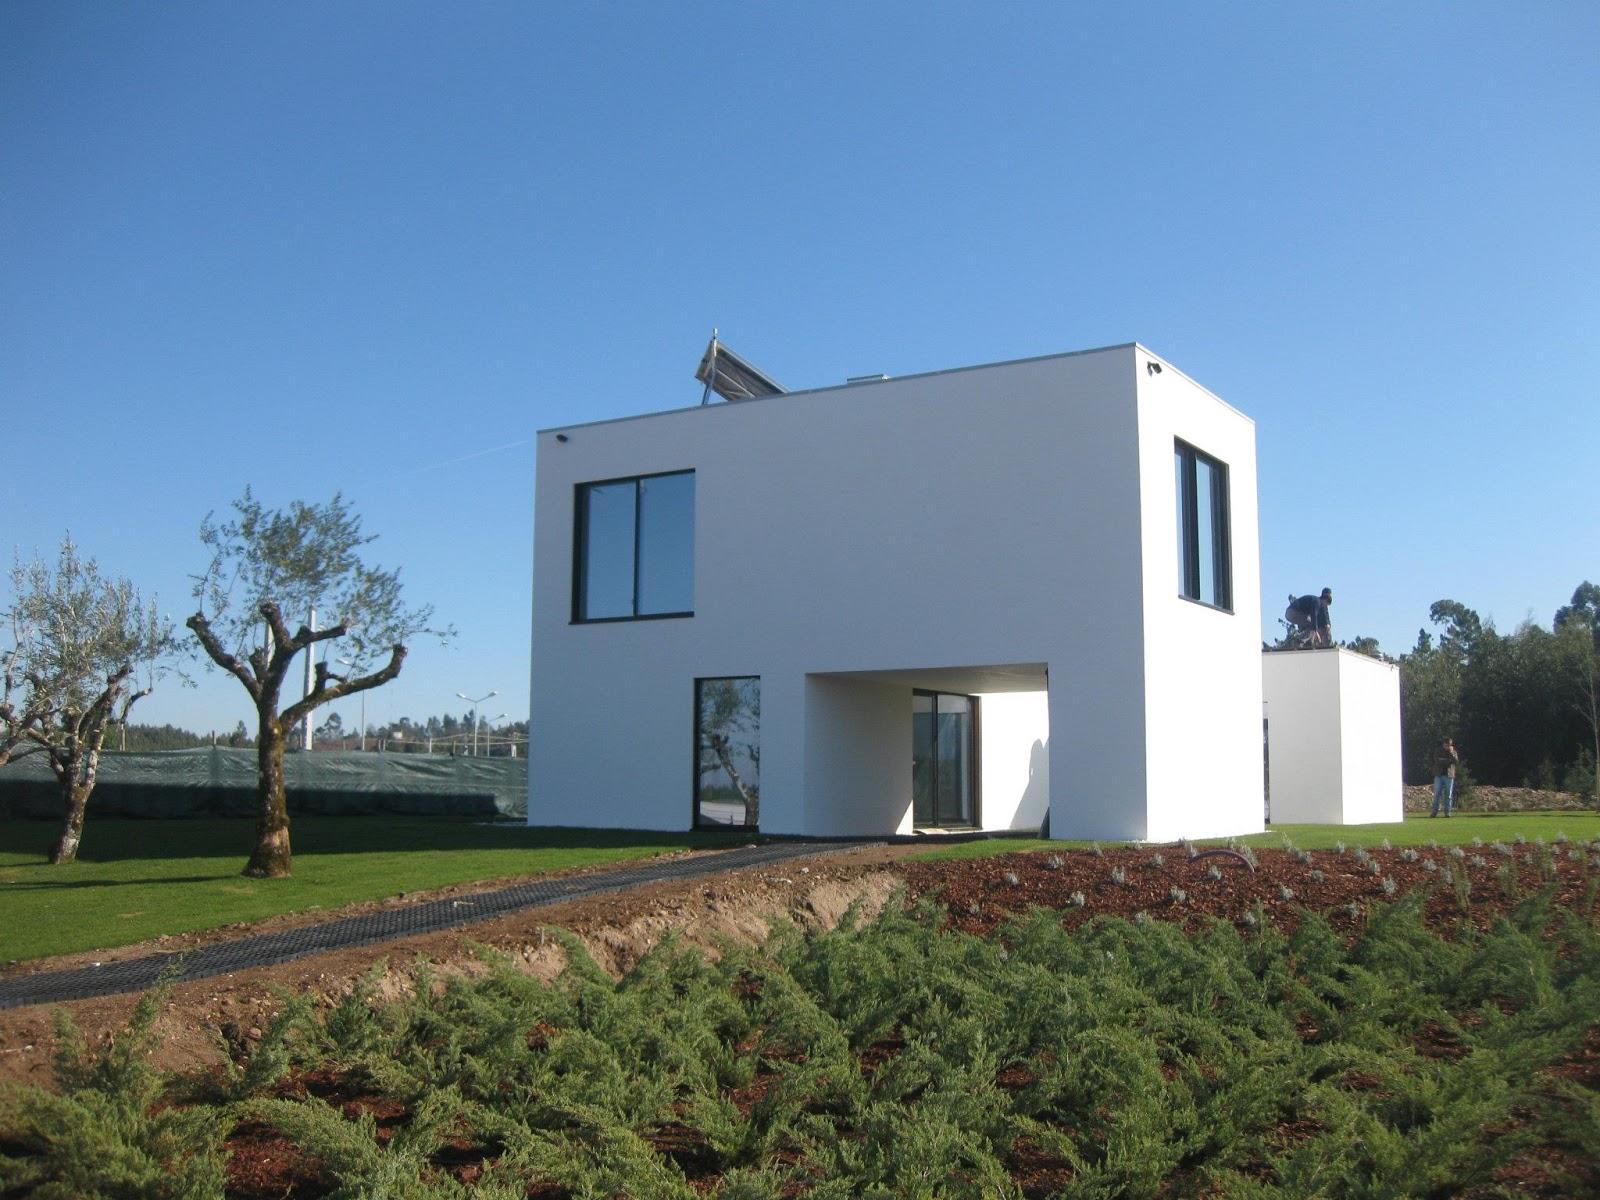 Cool haven casa modular modular house portugal arq - Casas modulares portugal ...